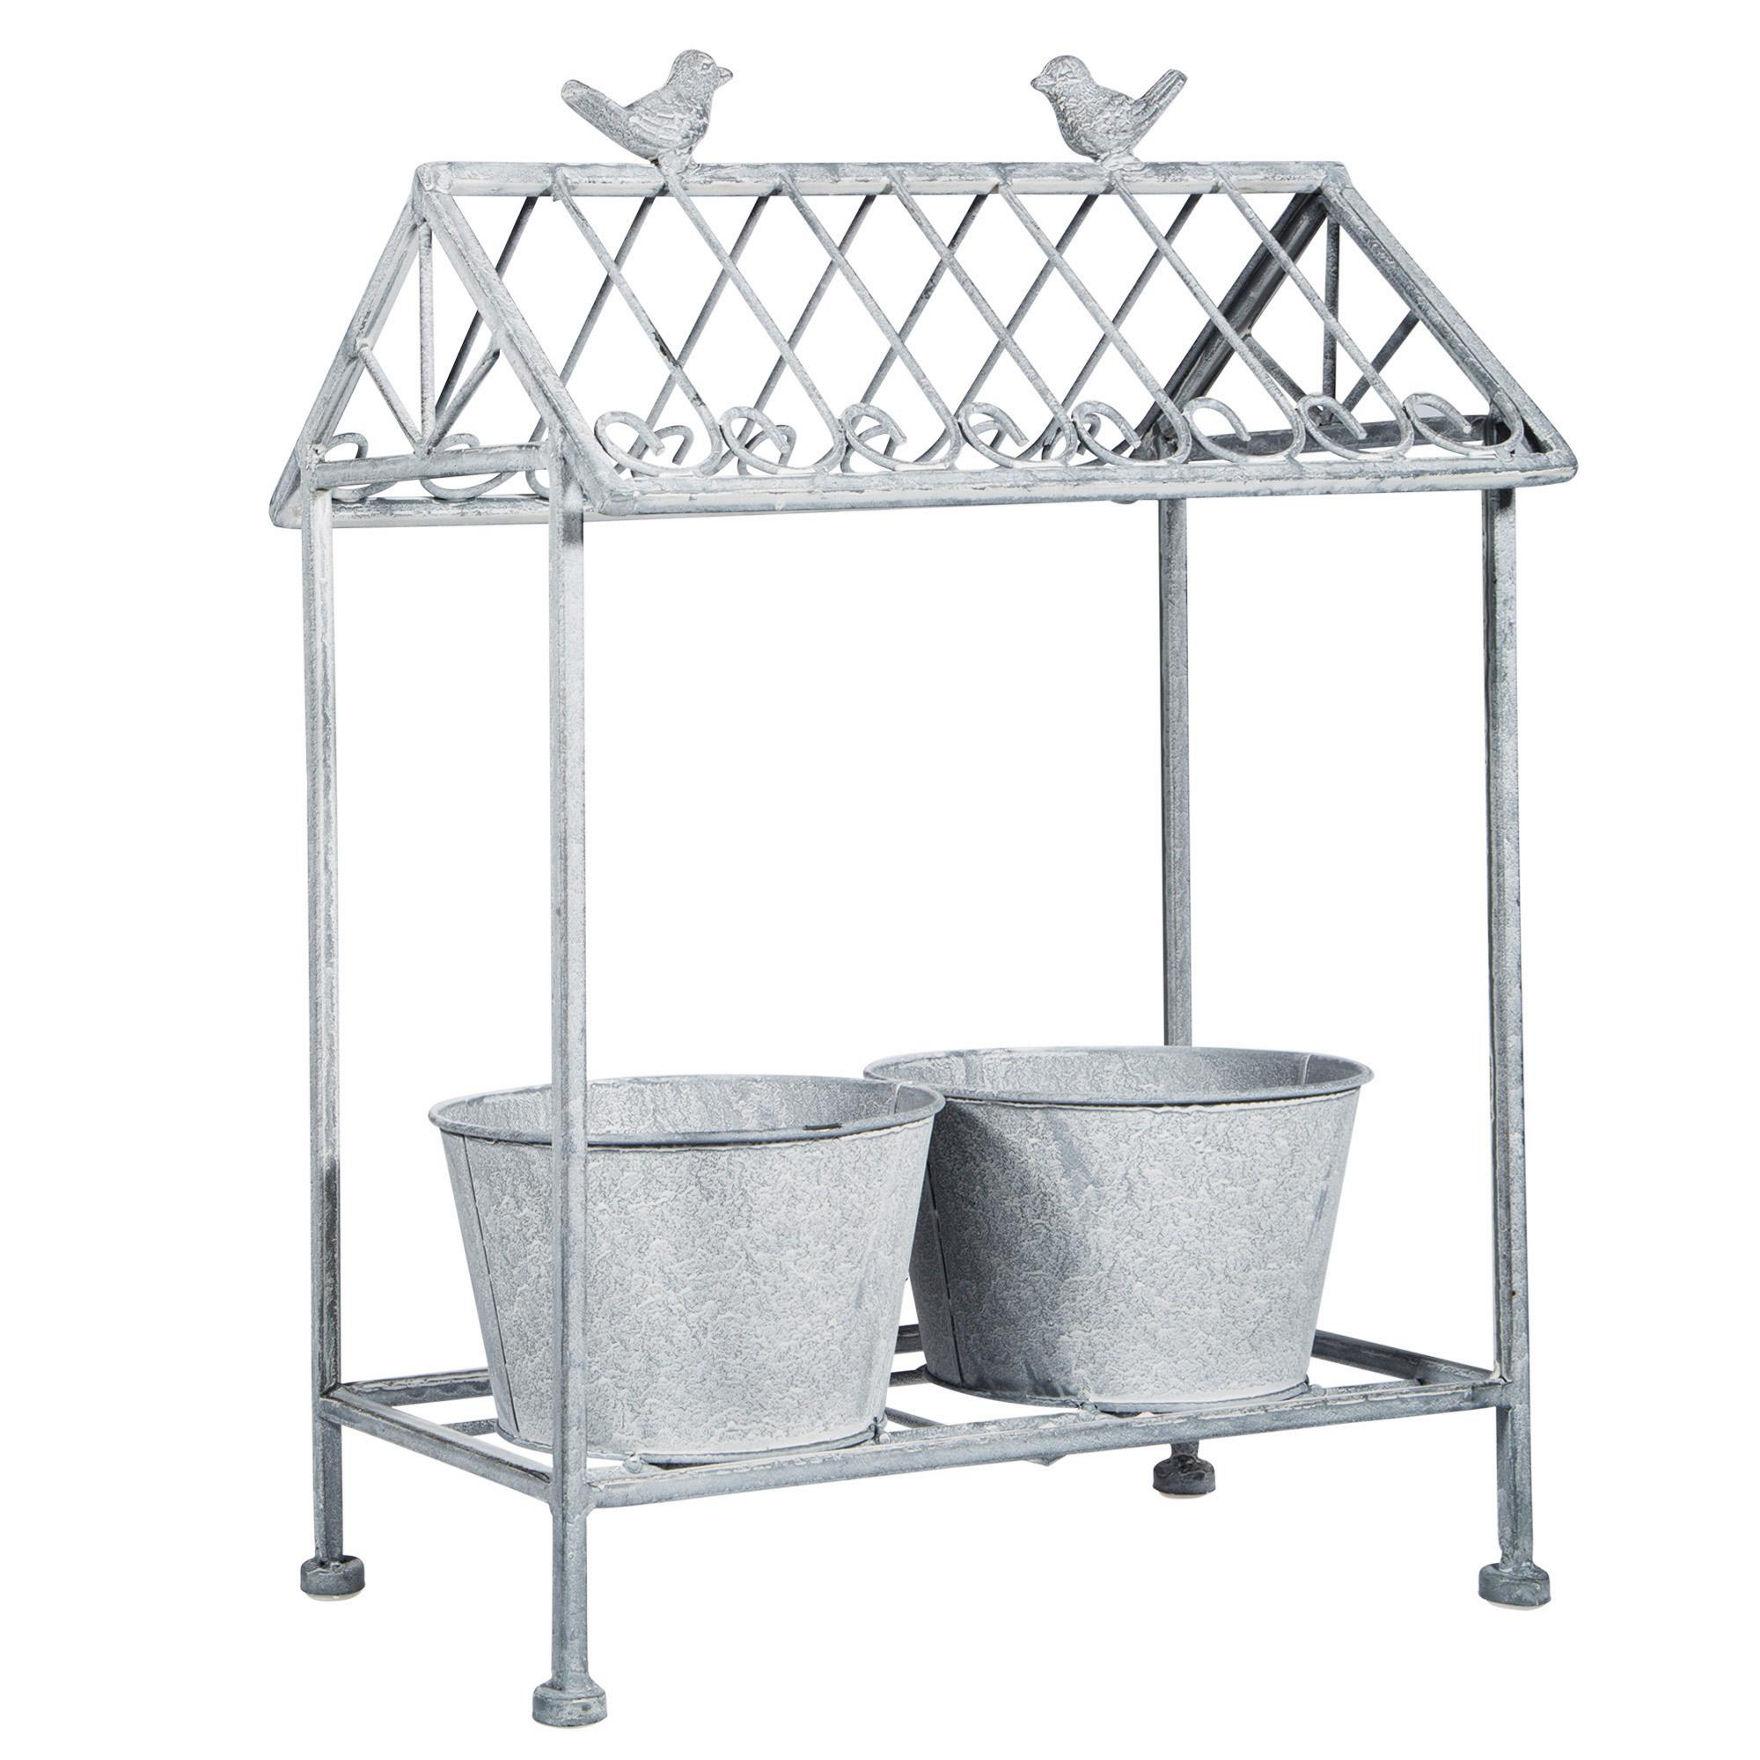 Home Essentials Silver Garden Decor & Planters Outdoor Decor